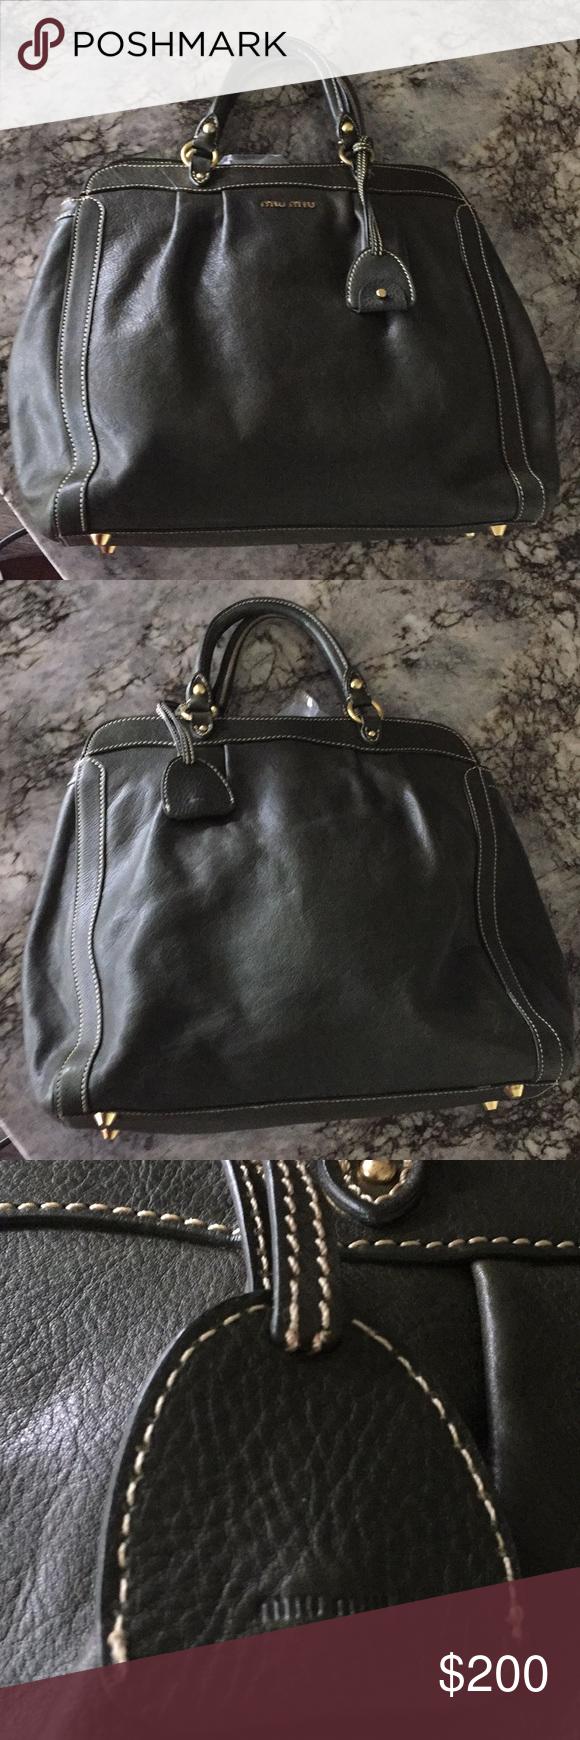 Authentic vintage Miu Miu bag Olive green distressed leather Miu Miu tote  with gold-tone 5473670503